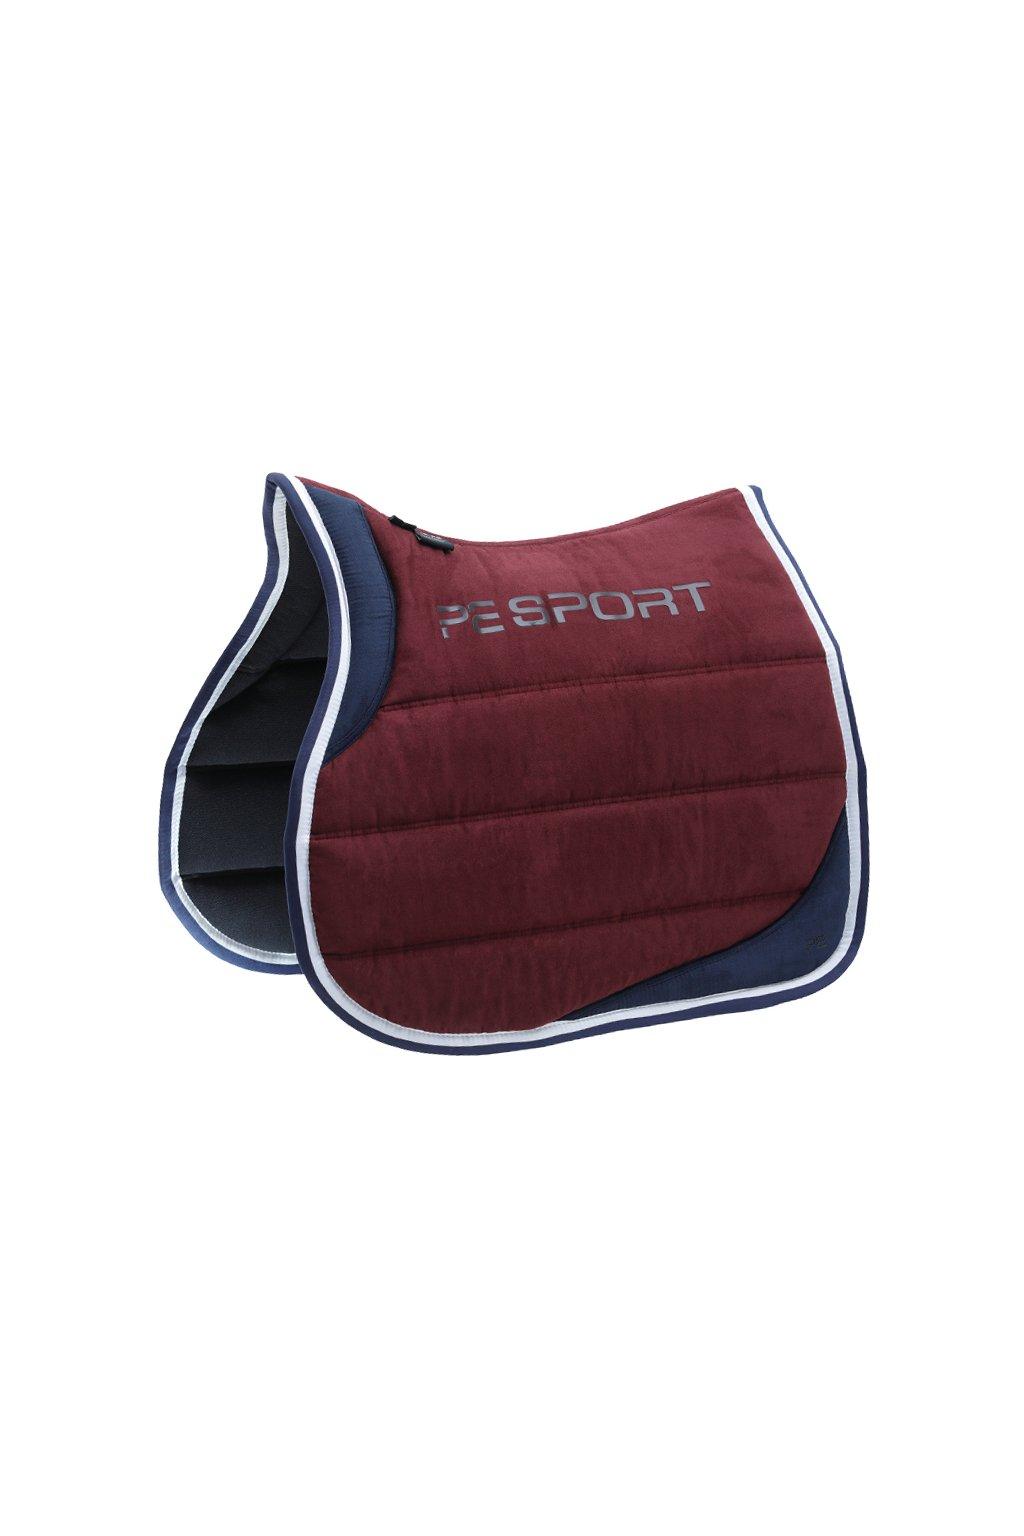 SS20 PE Sport Techno Suede GP Jump Pad Wine Main Image 72 RGB zoom